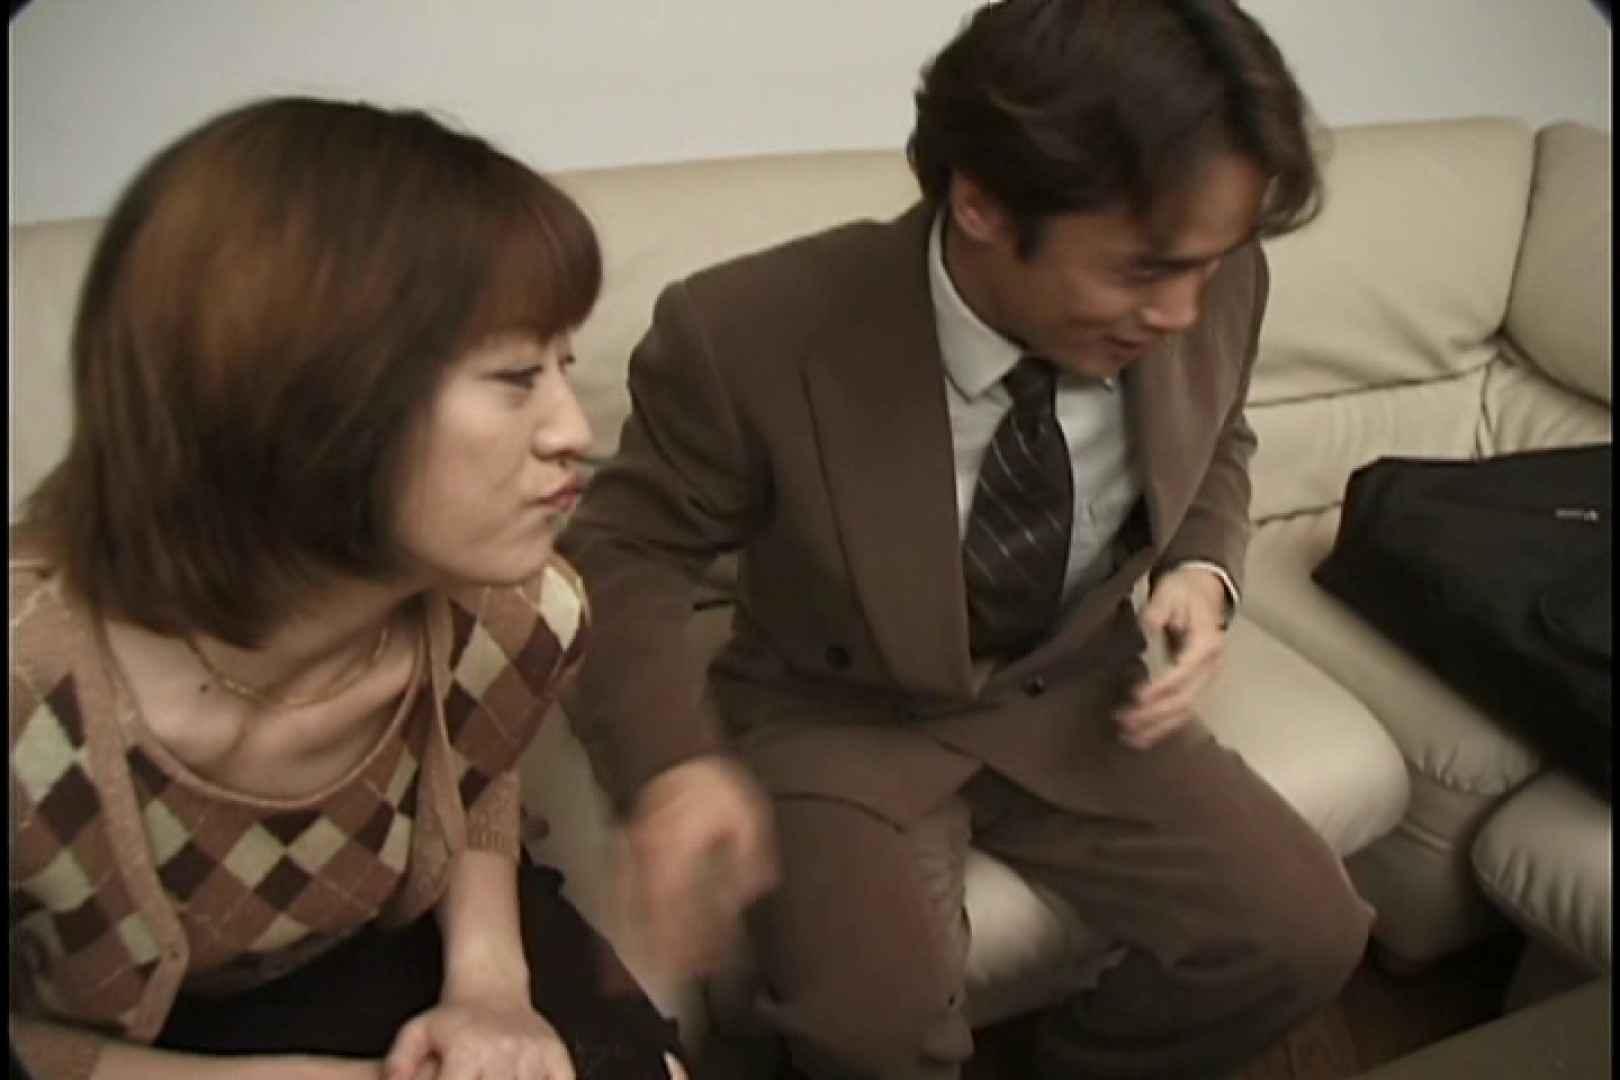 昼間の奥様は欲求不満 ~石川麻紀~ 熟女  111連発 27